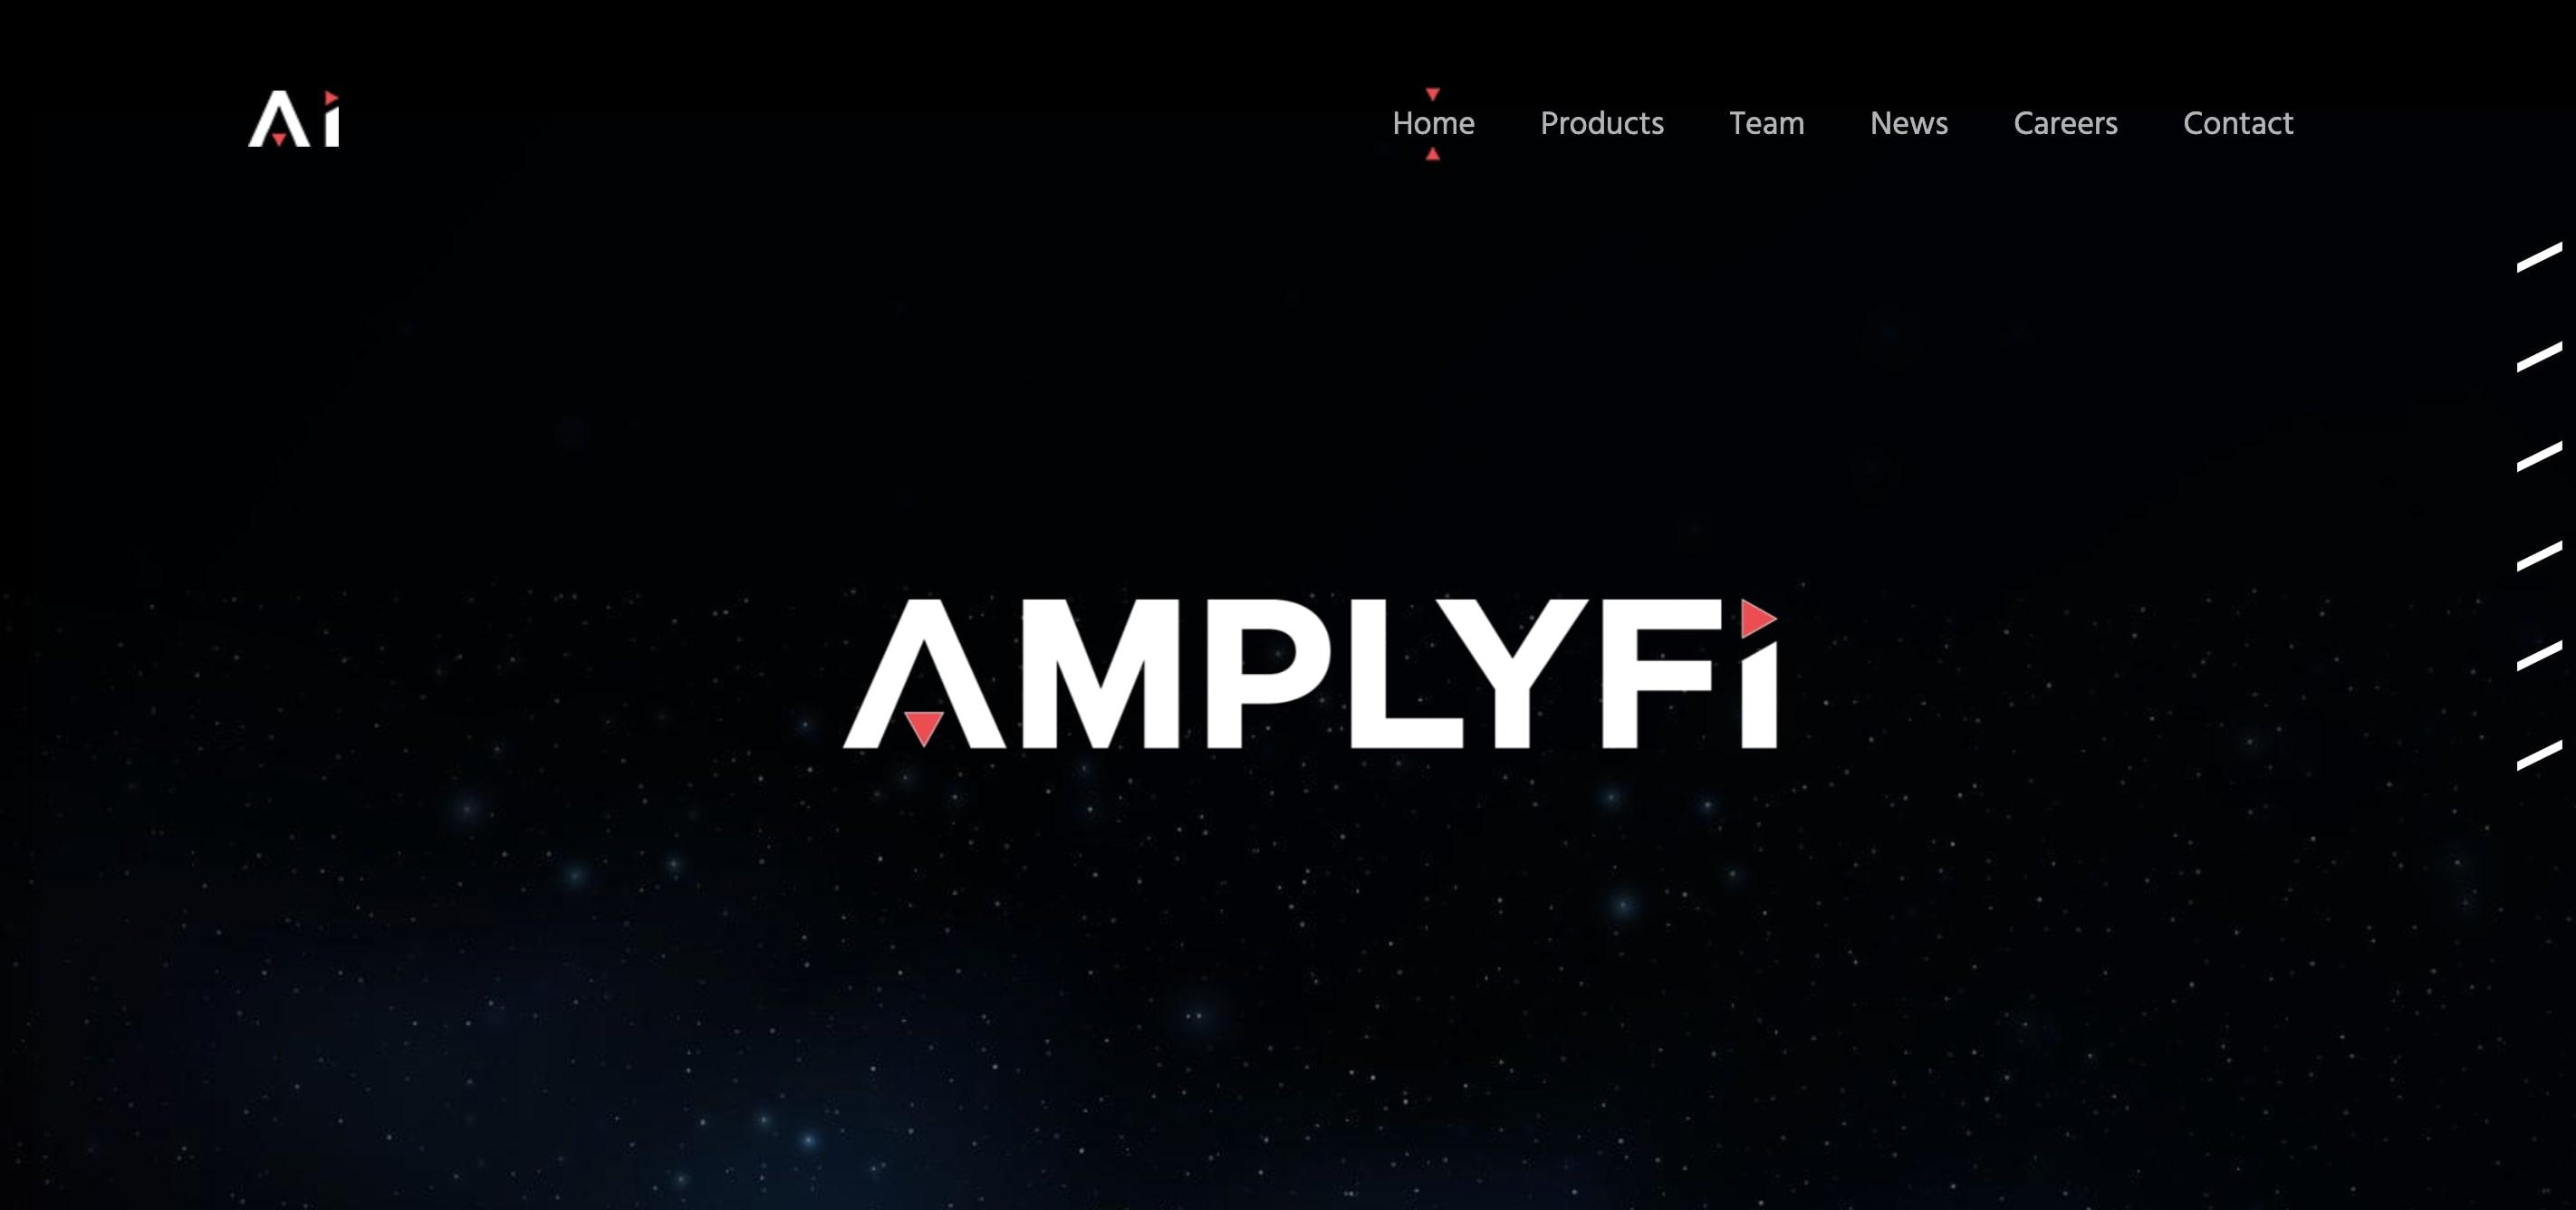 Amplyfi AI company website homepage